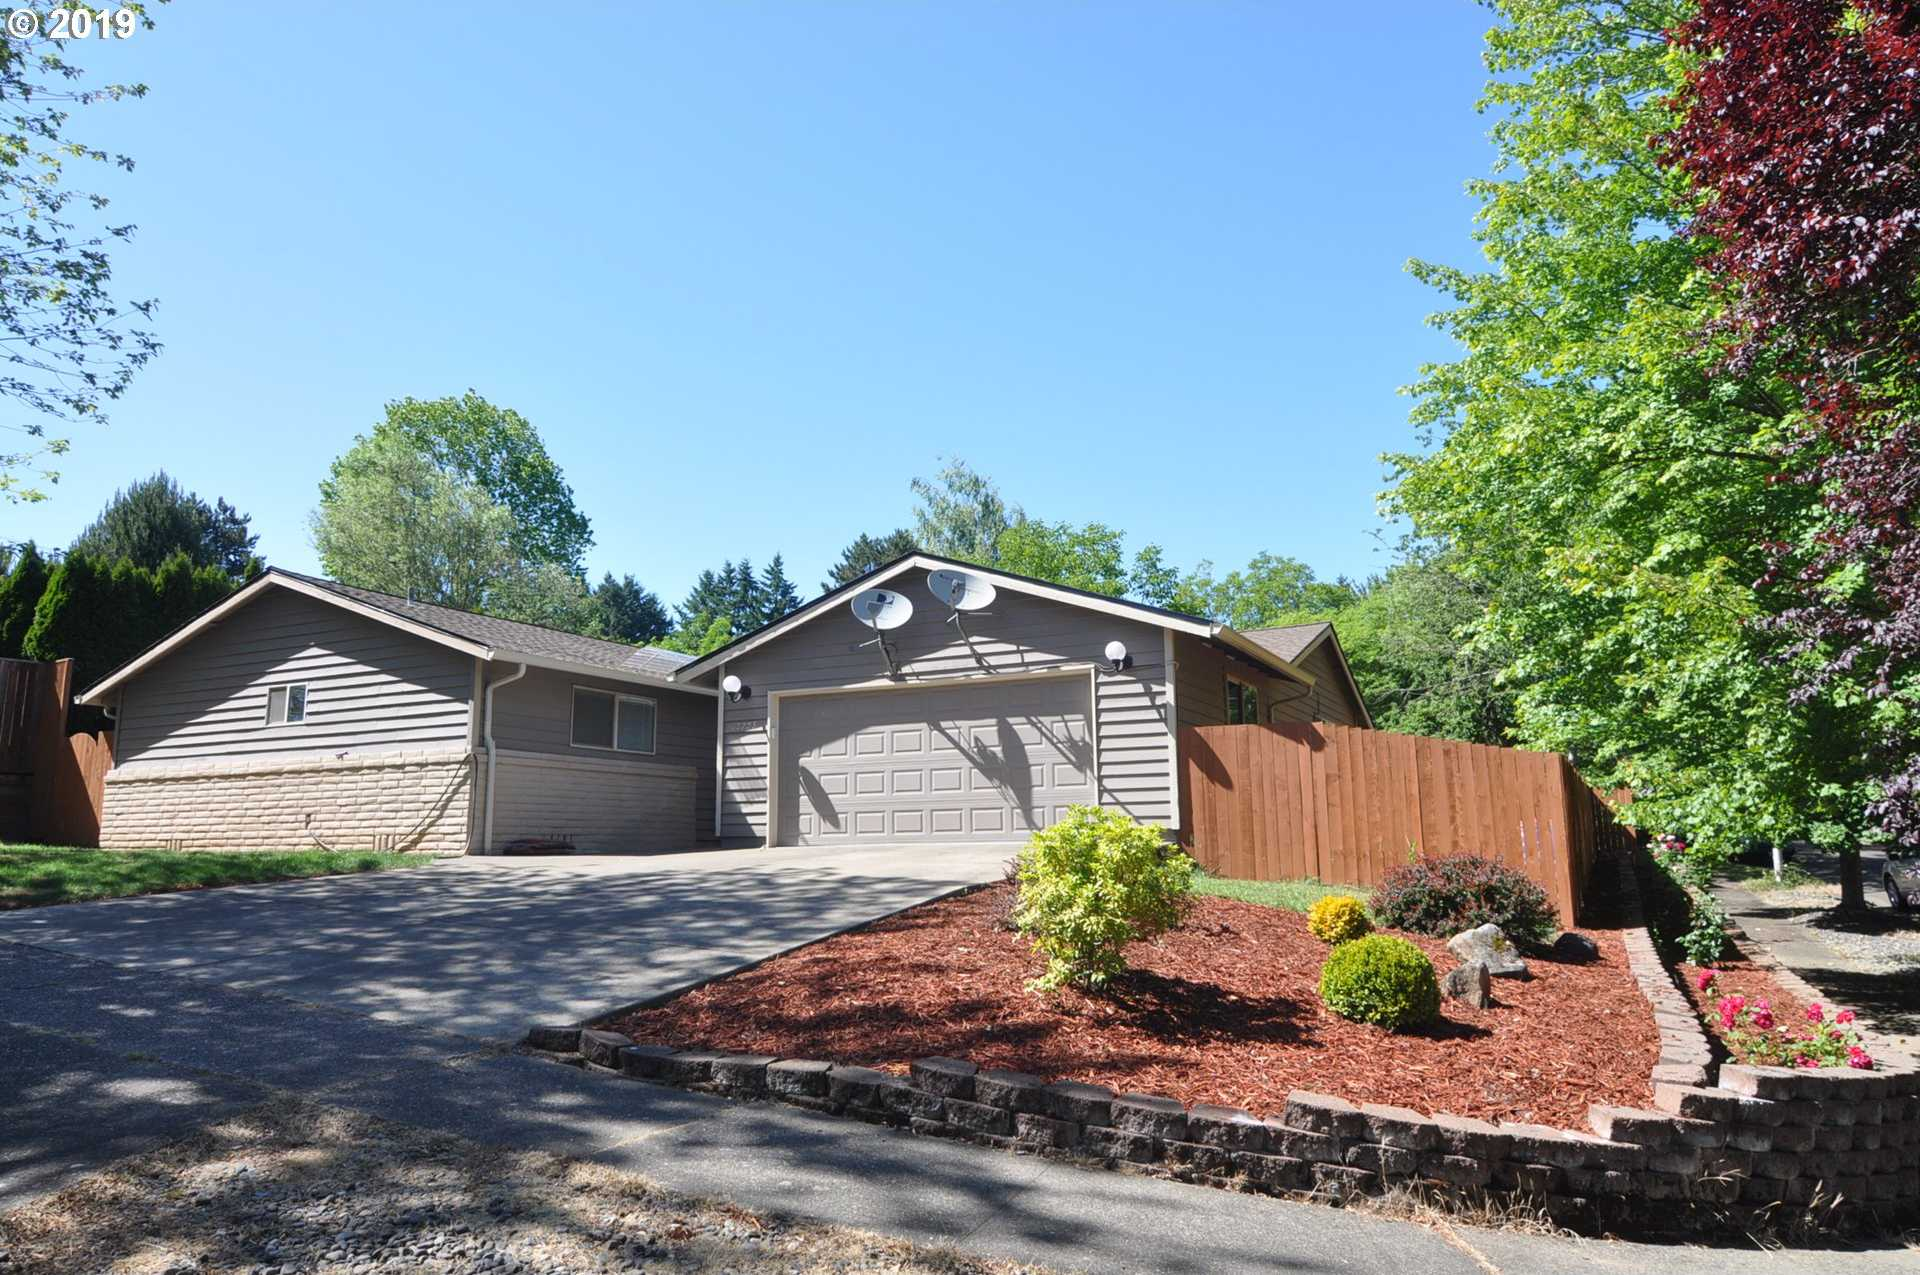 $499,900 - 4Br/3Ba -  for Sale in Beaverton